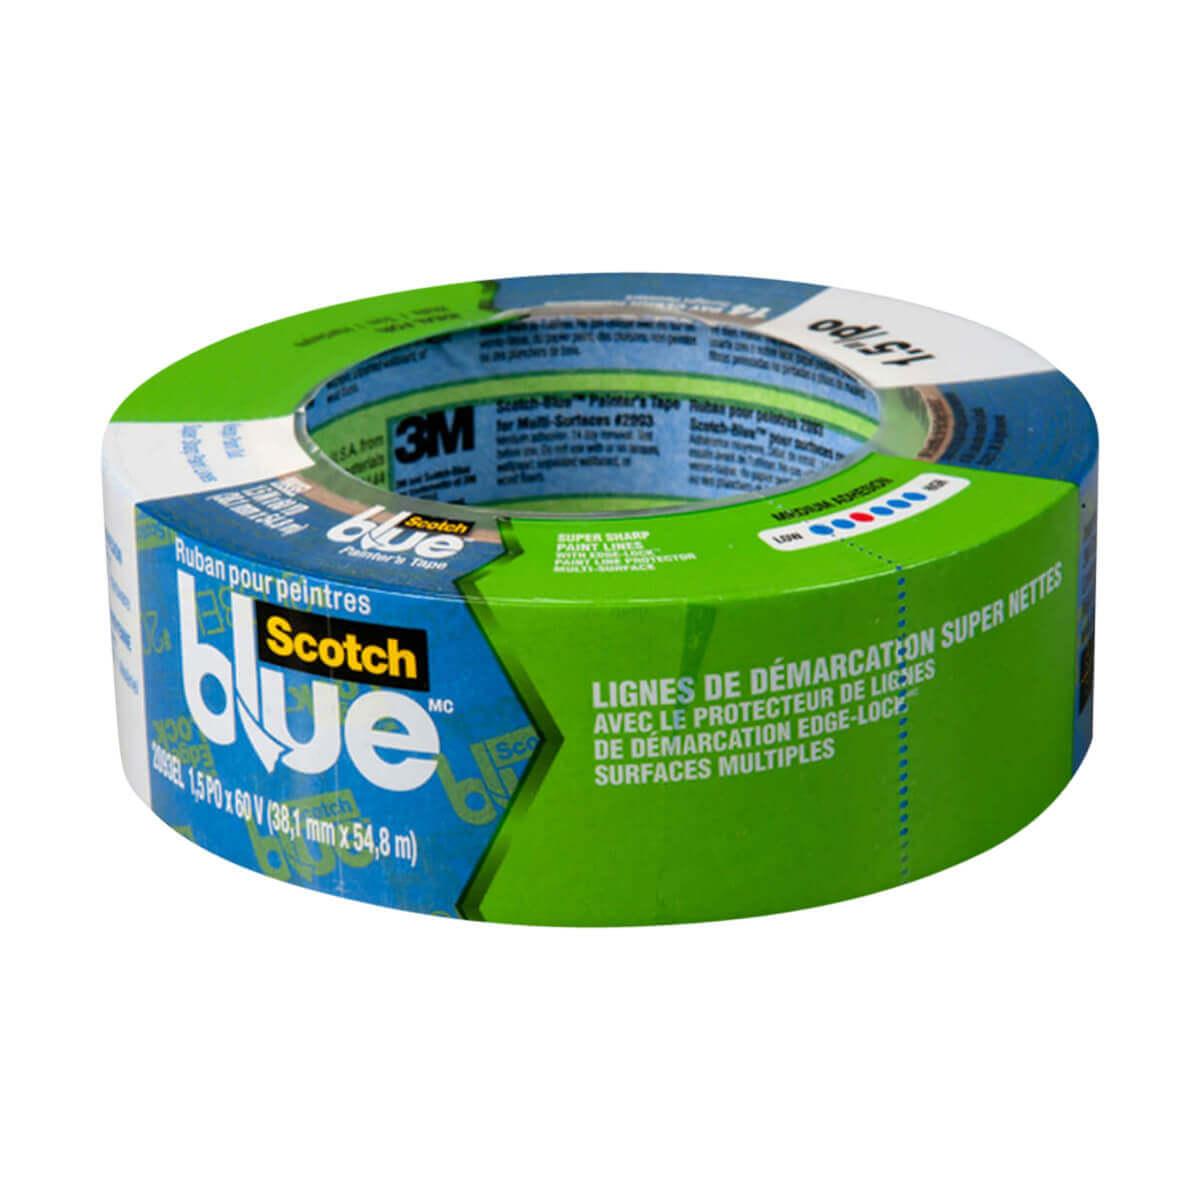 ScotchBlue Painter's Tape Multi-Surface